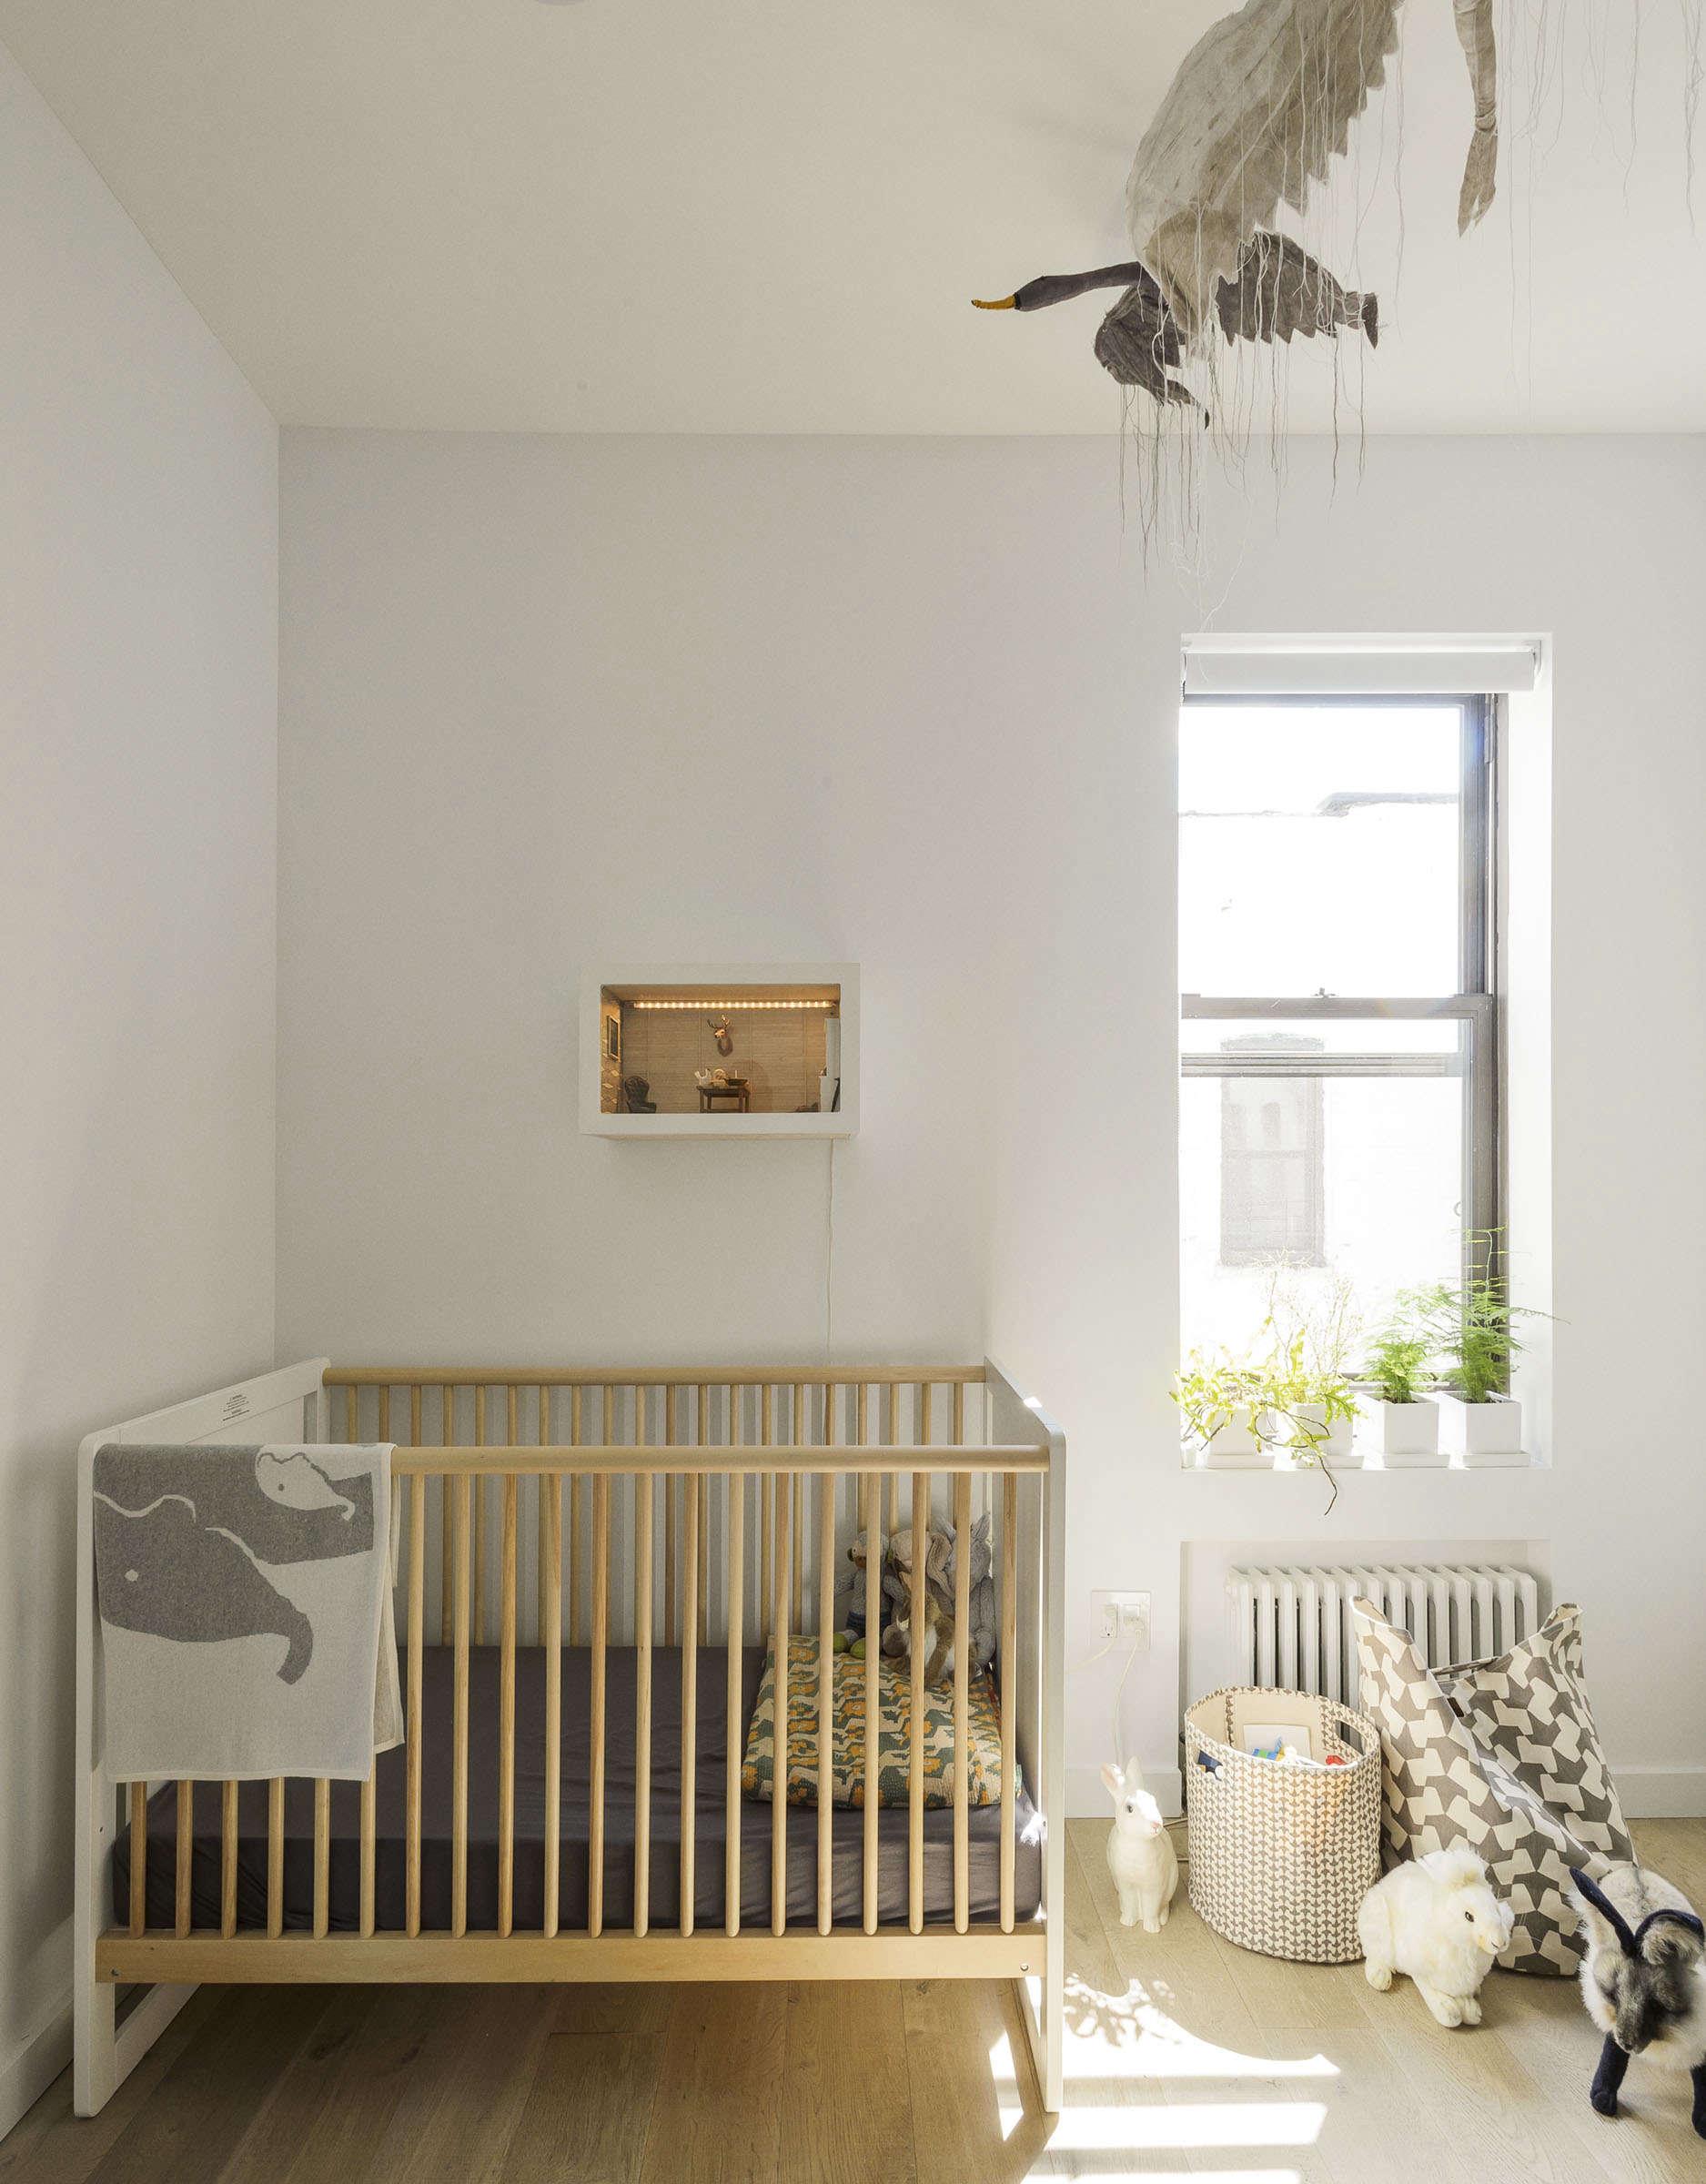 Oeuf crib, Matthew Williams photo | Remodelista